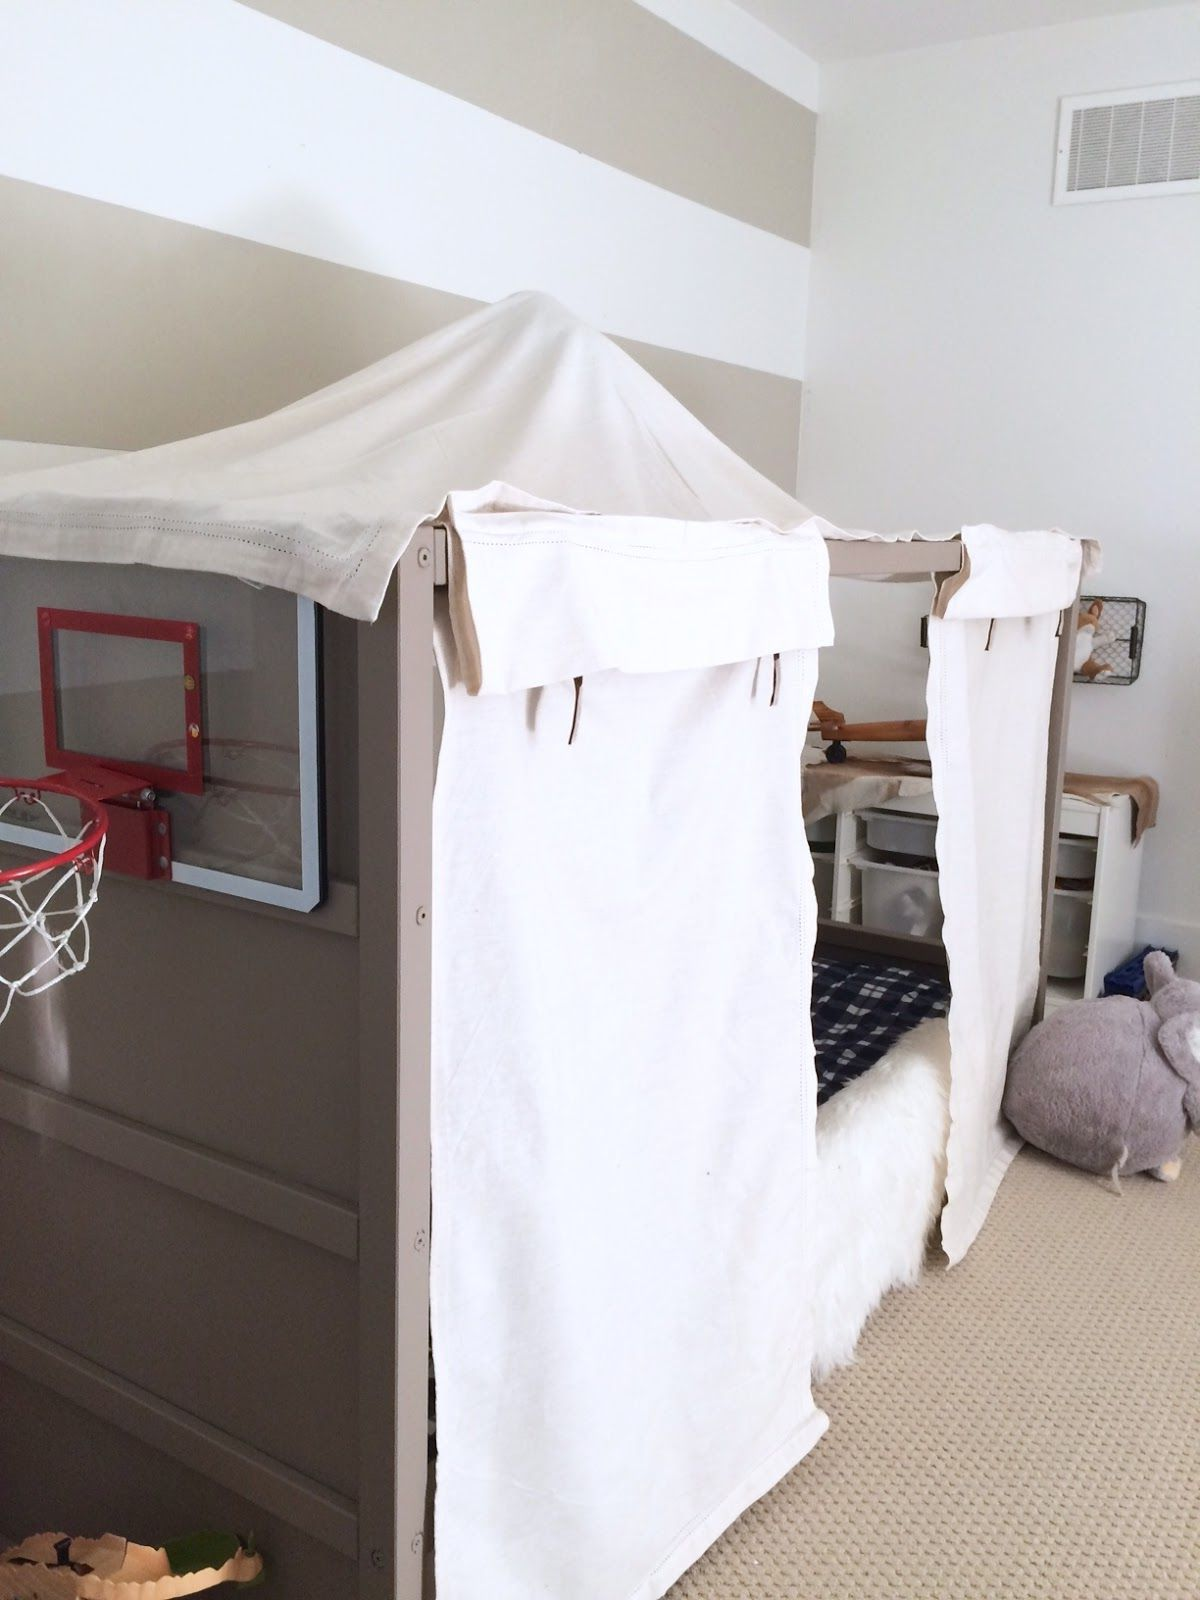 Kinderbett Ikea mit Ikea Vorhänge pimpen